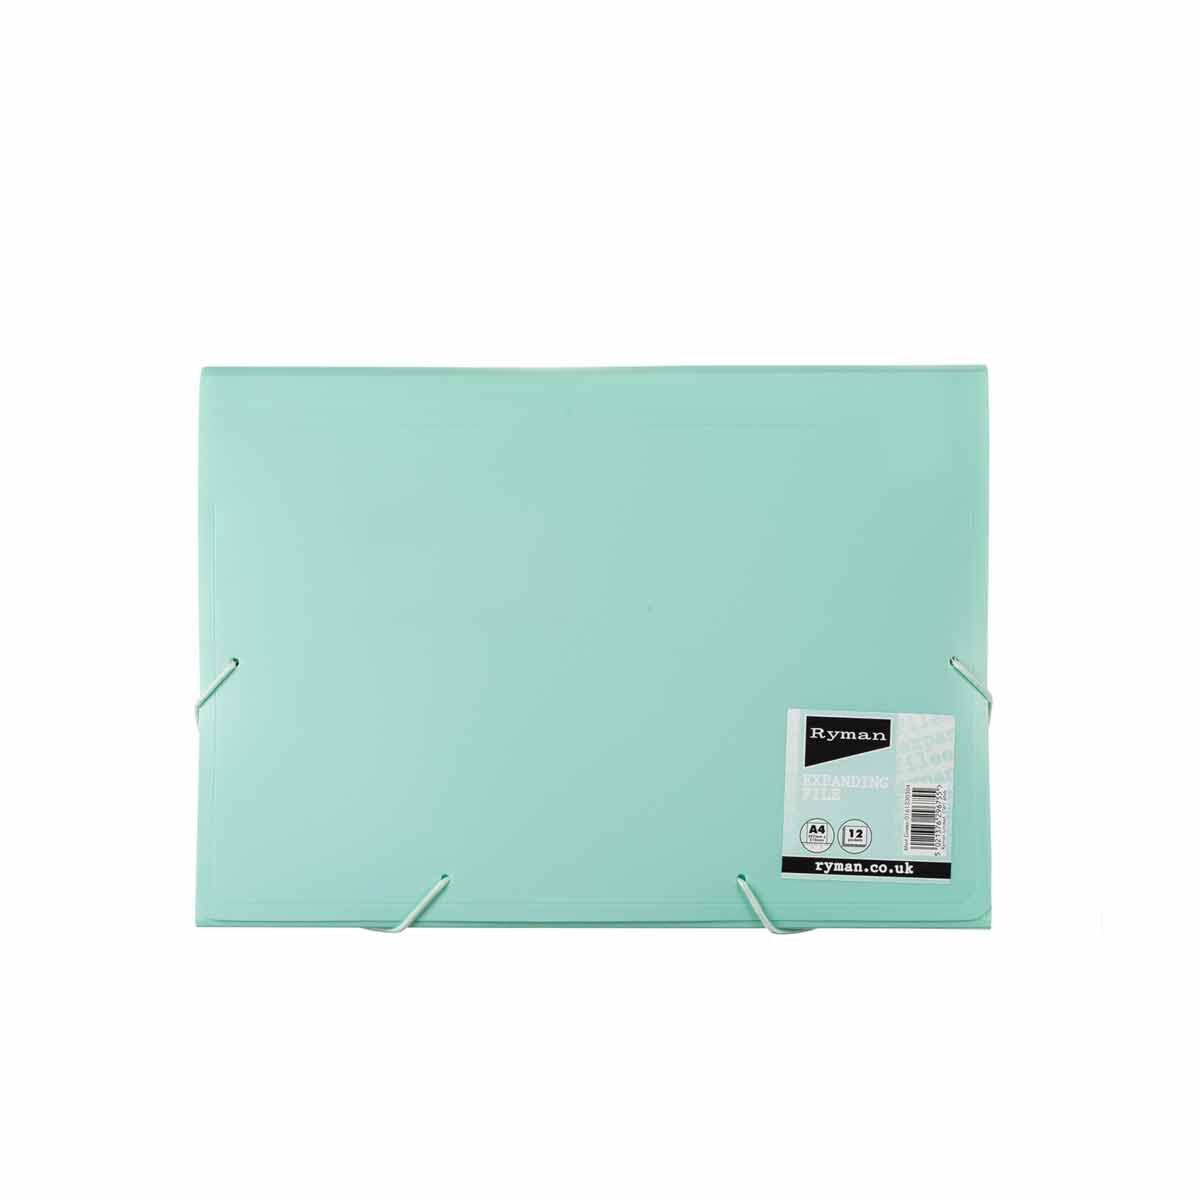 Ryman Pastel Expanding File A4 Mint